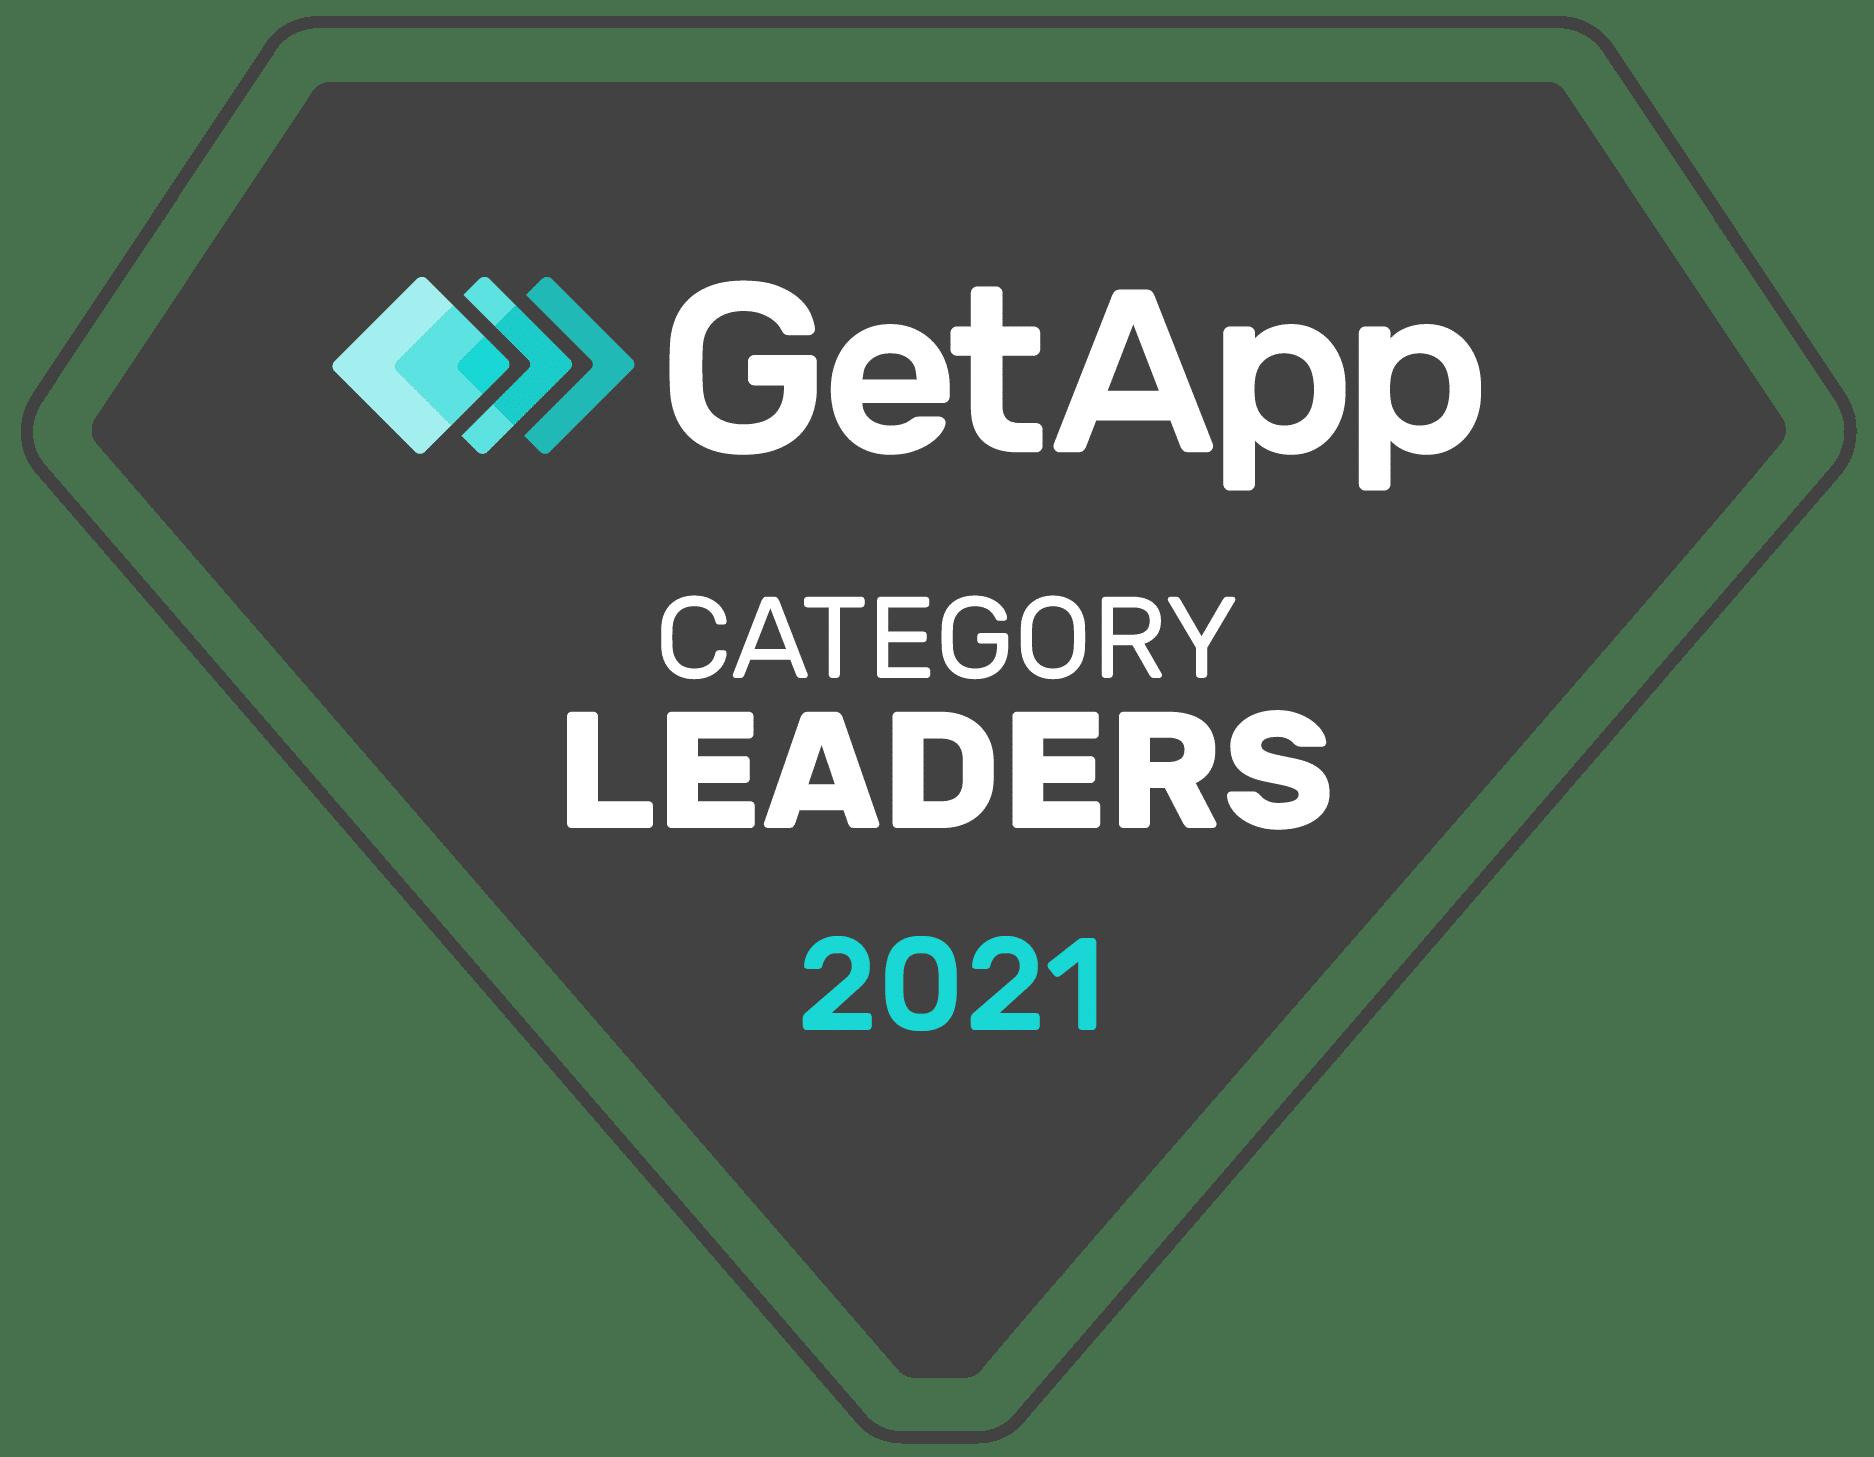 GetApp Time Clock Software Category Leader